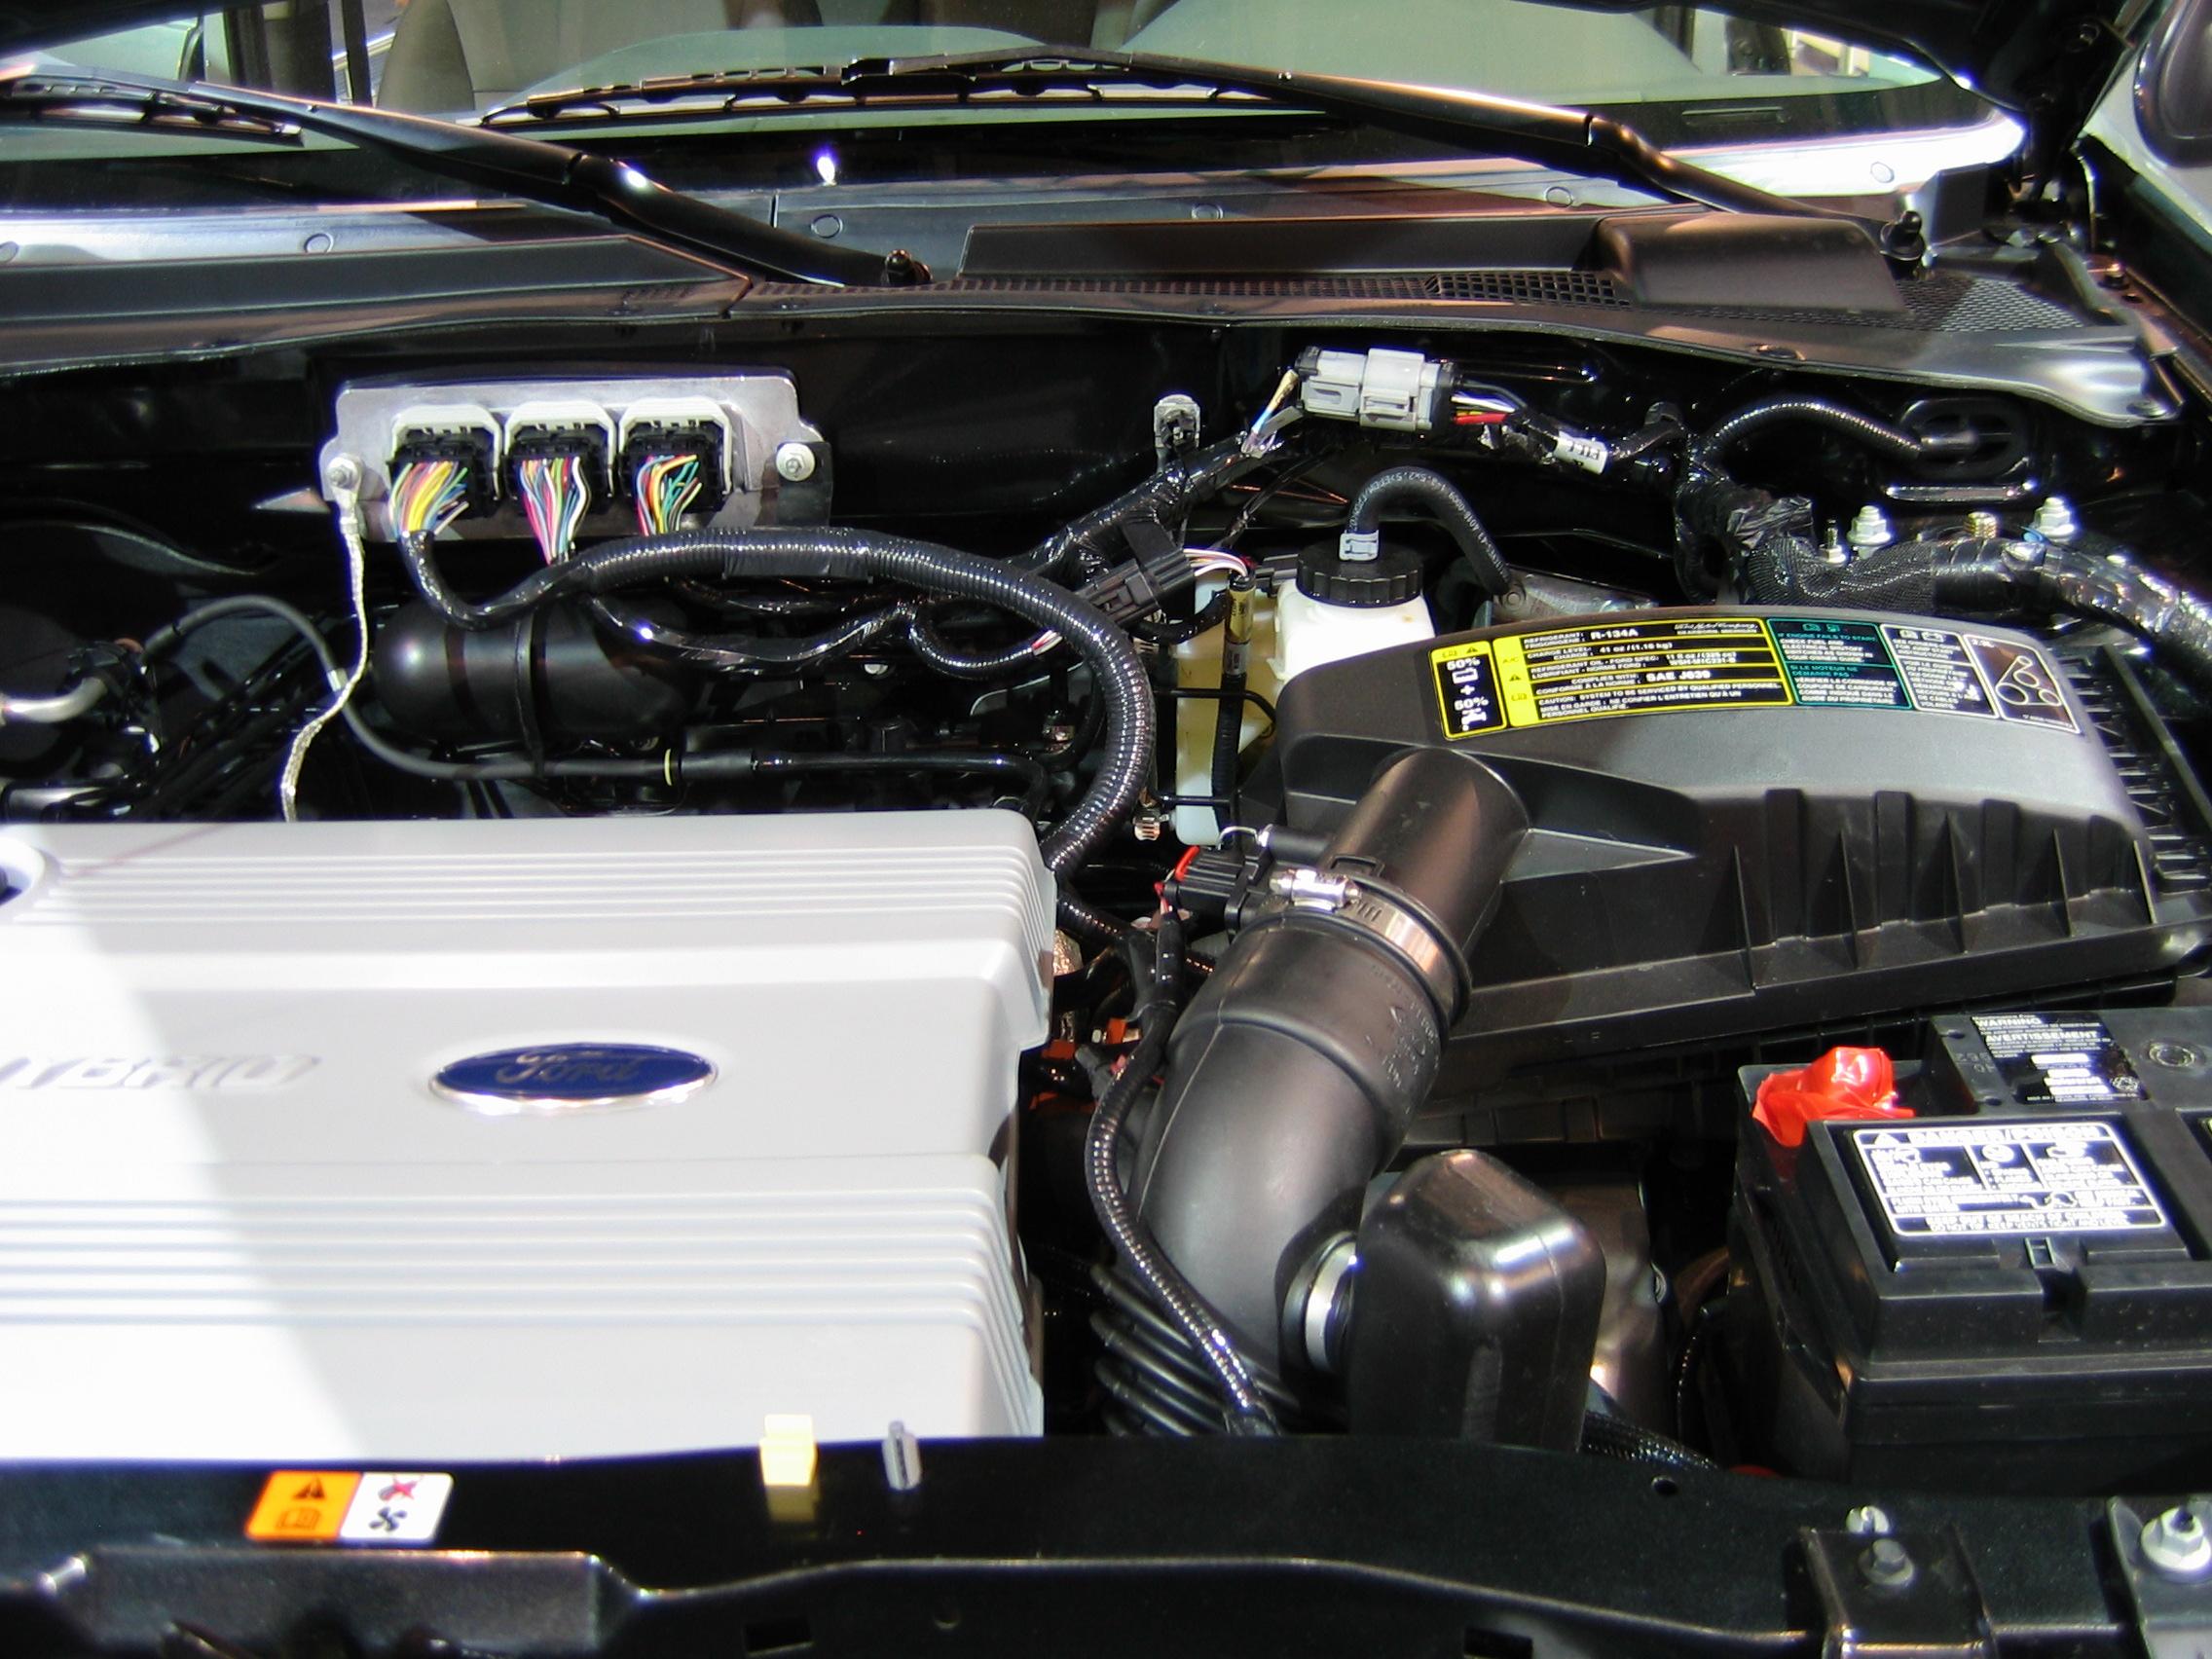 FileWashauto06 ford escape hybrid engine2jpg  Wikimedia Commons